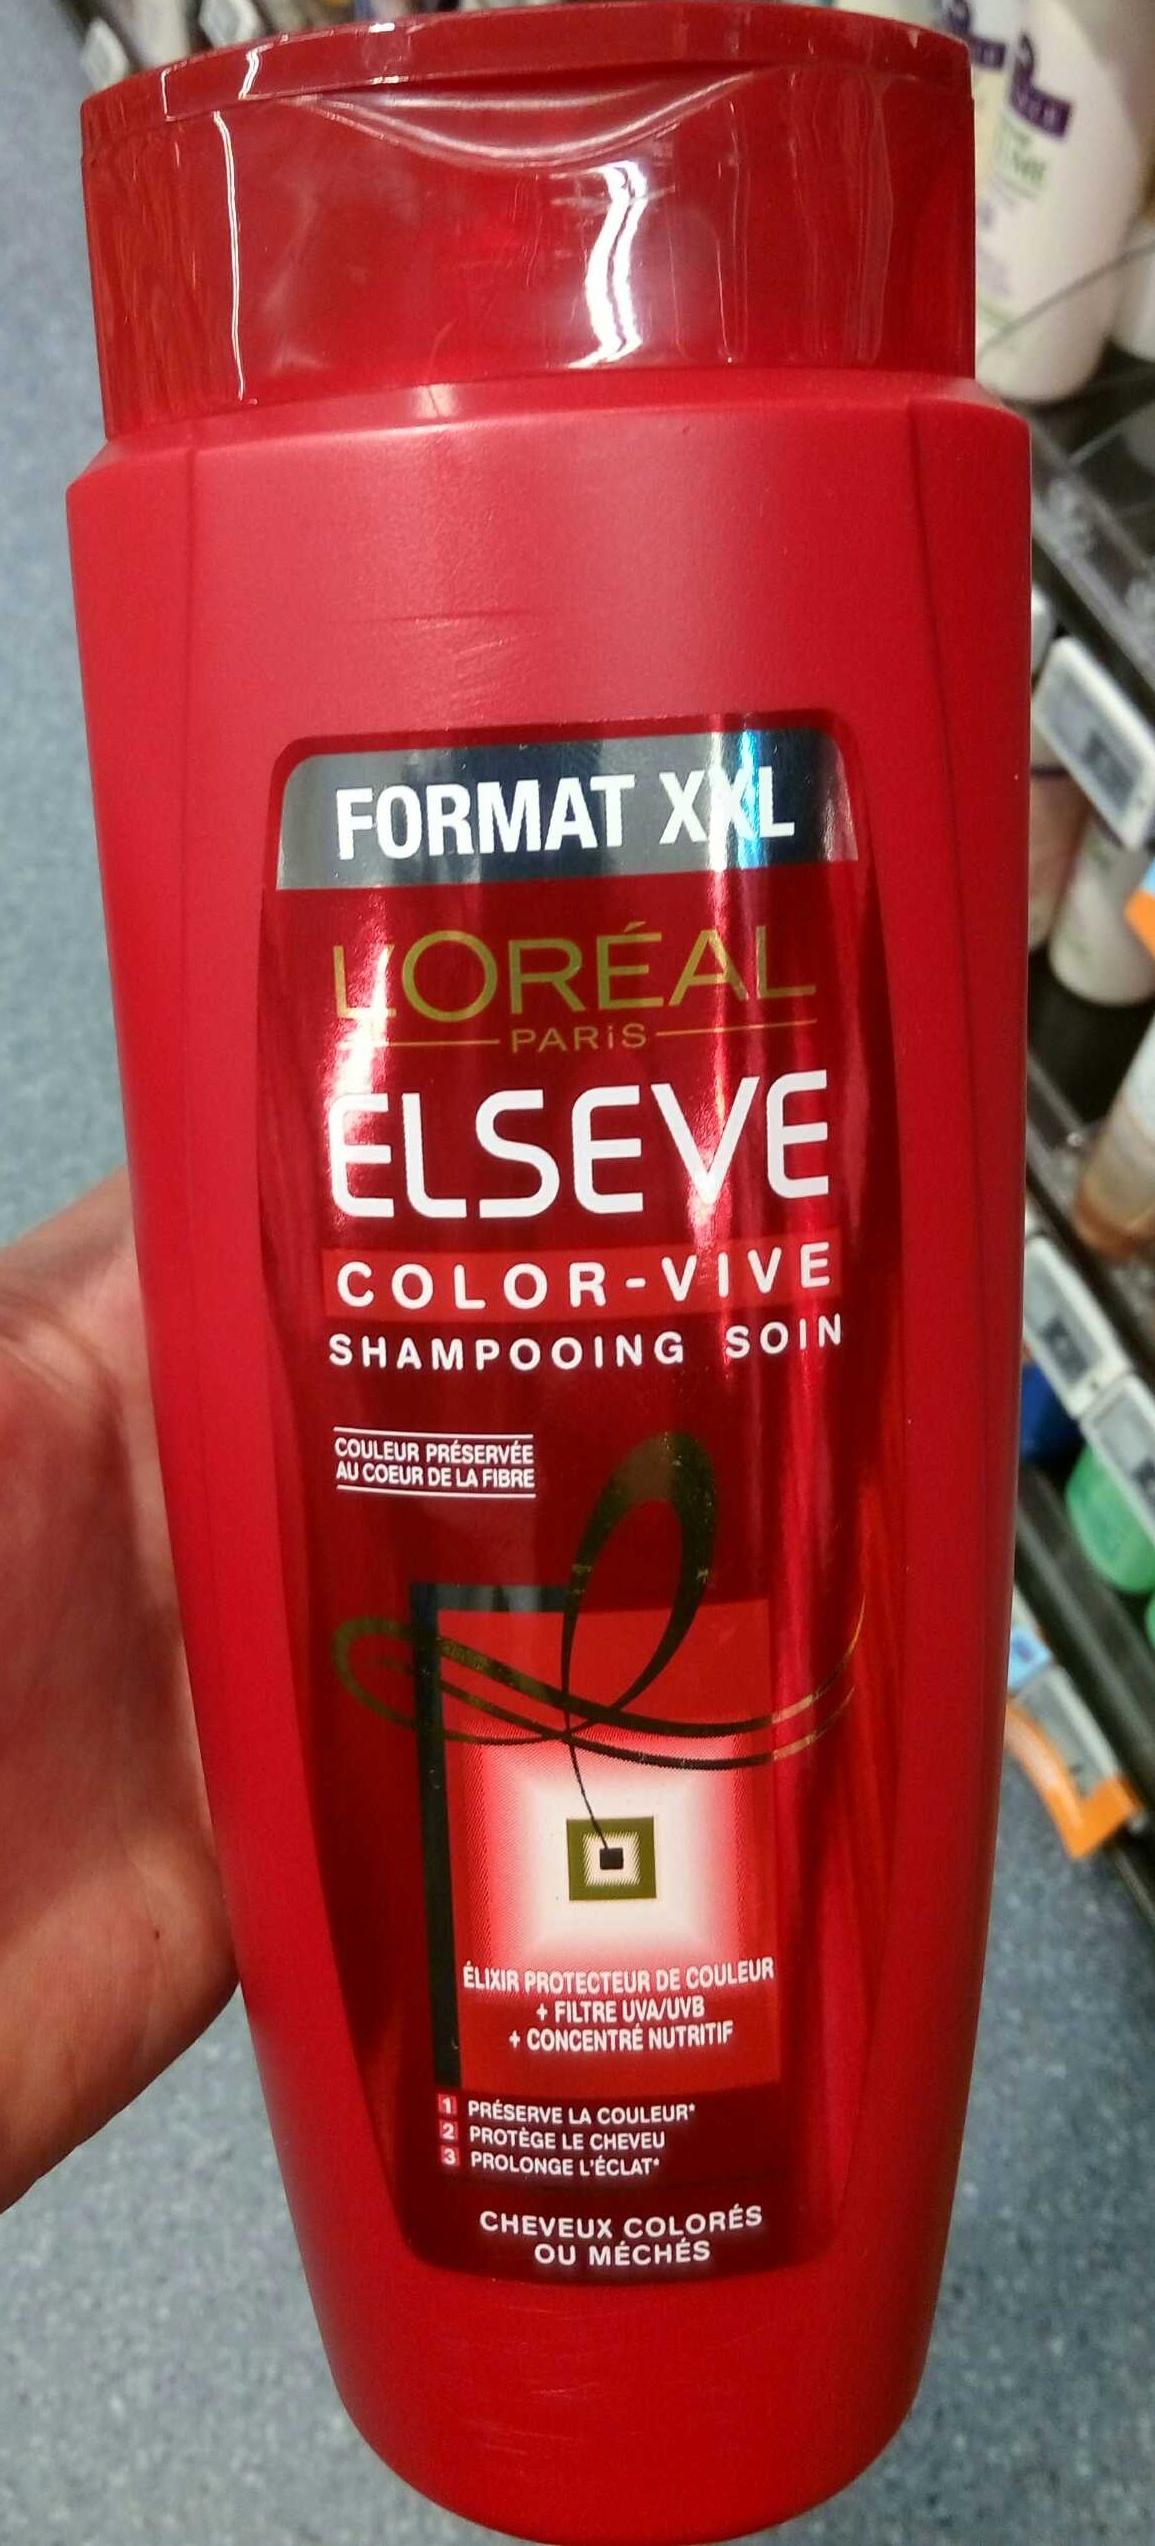 elseve color vive shampooing soin format xxl product - Elseve Color Vive